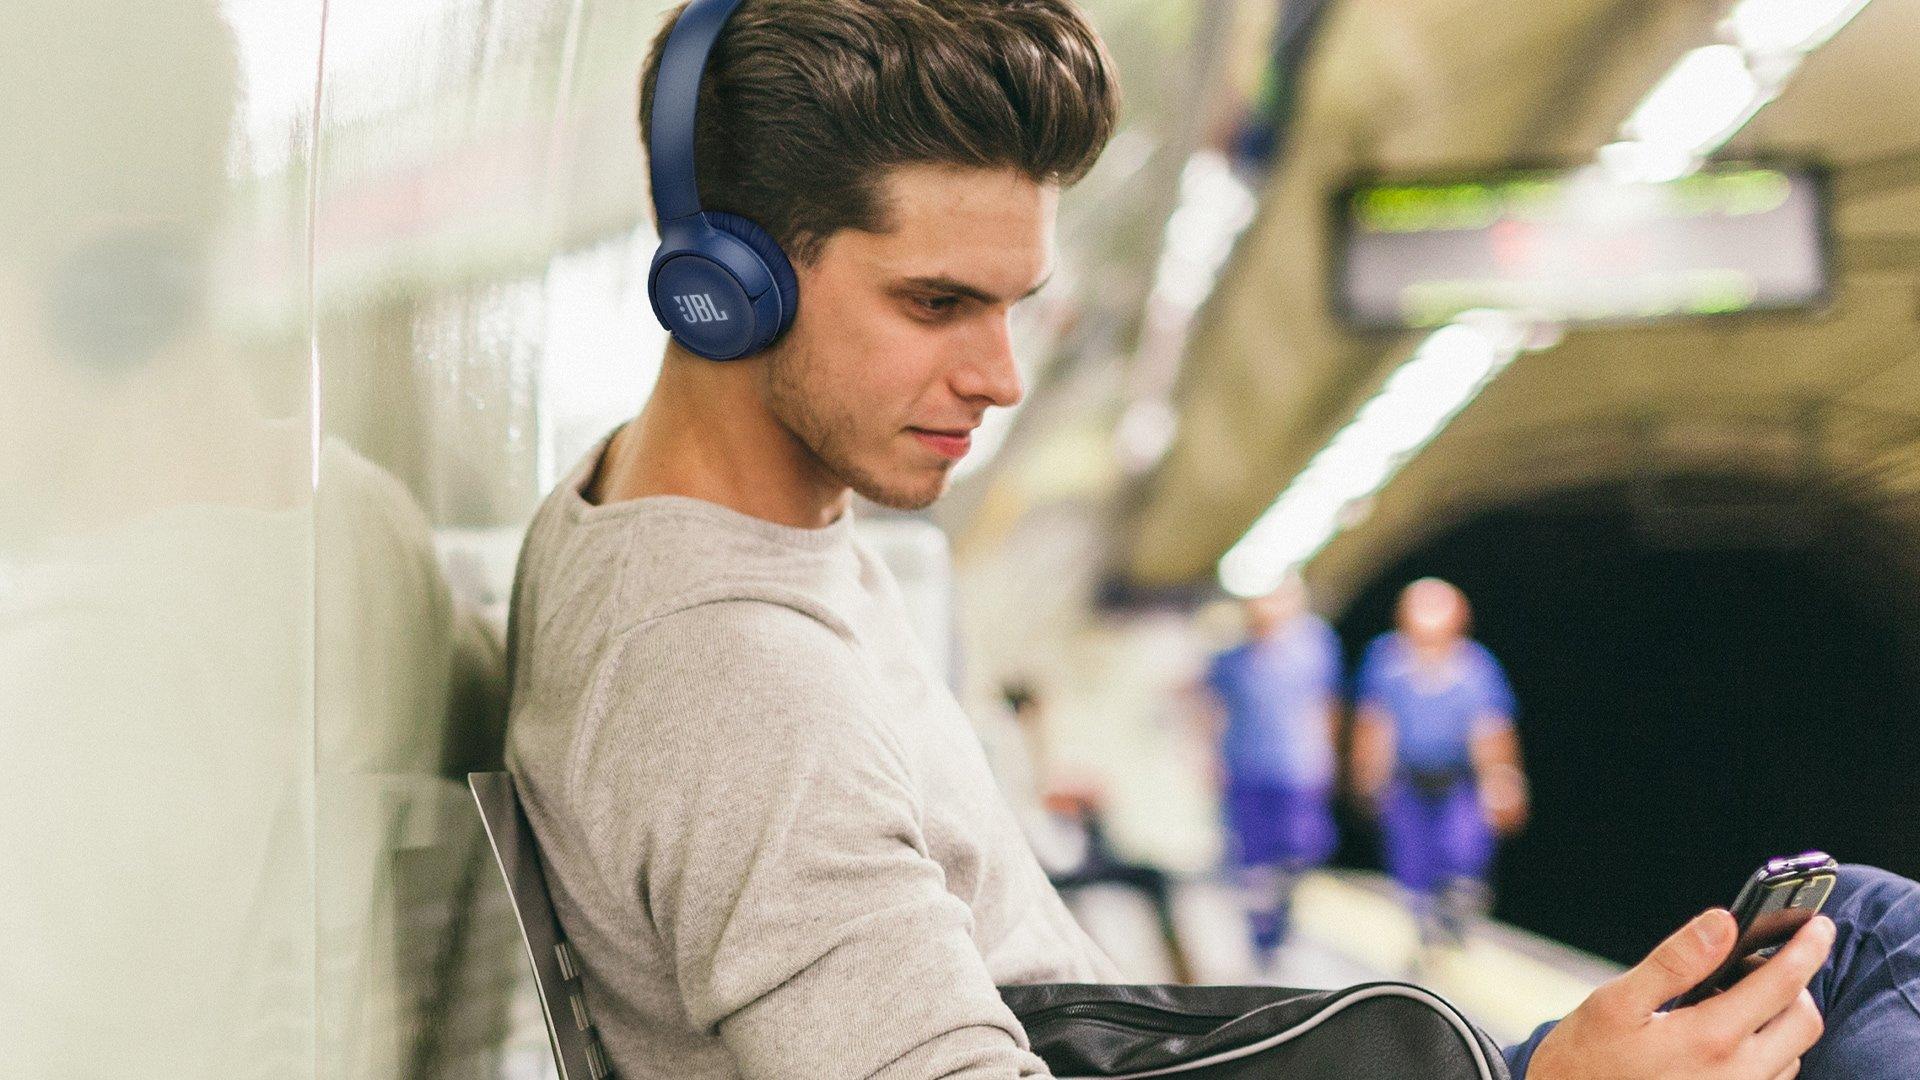 Purchasing The Headphones